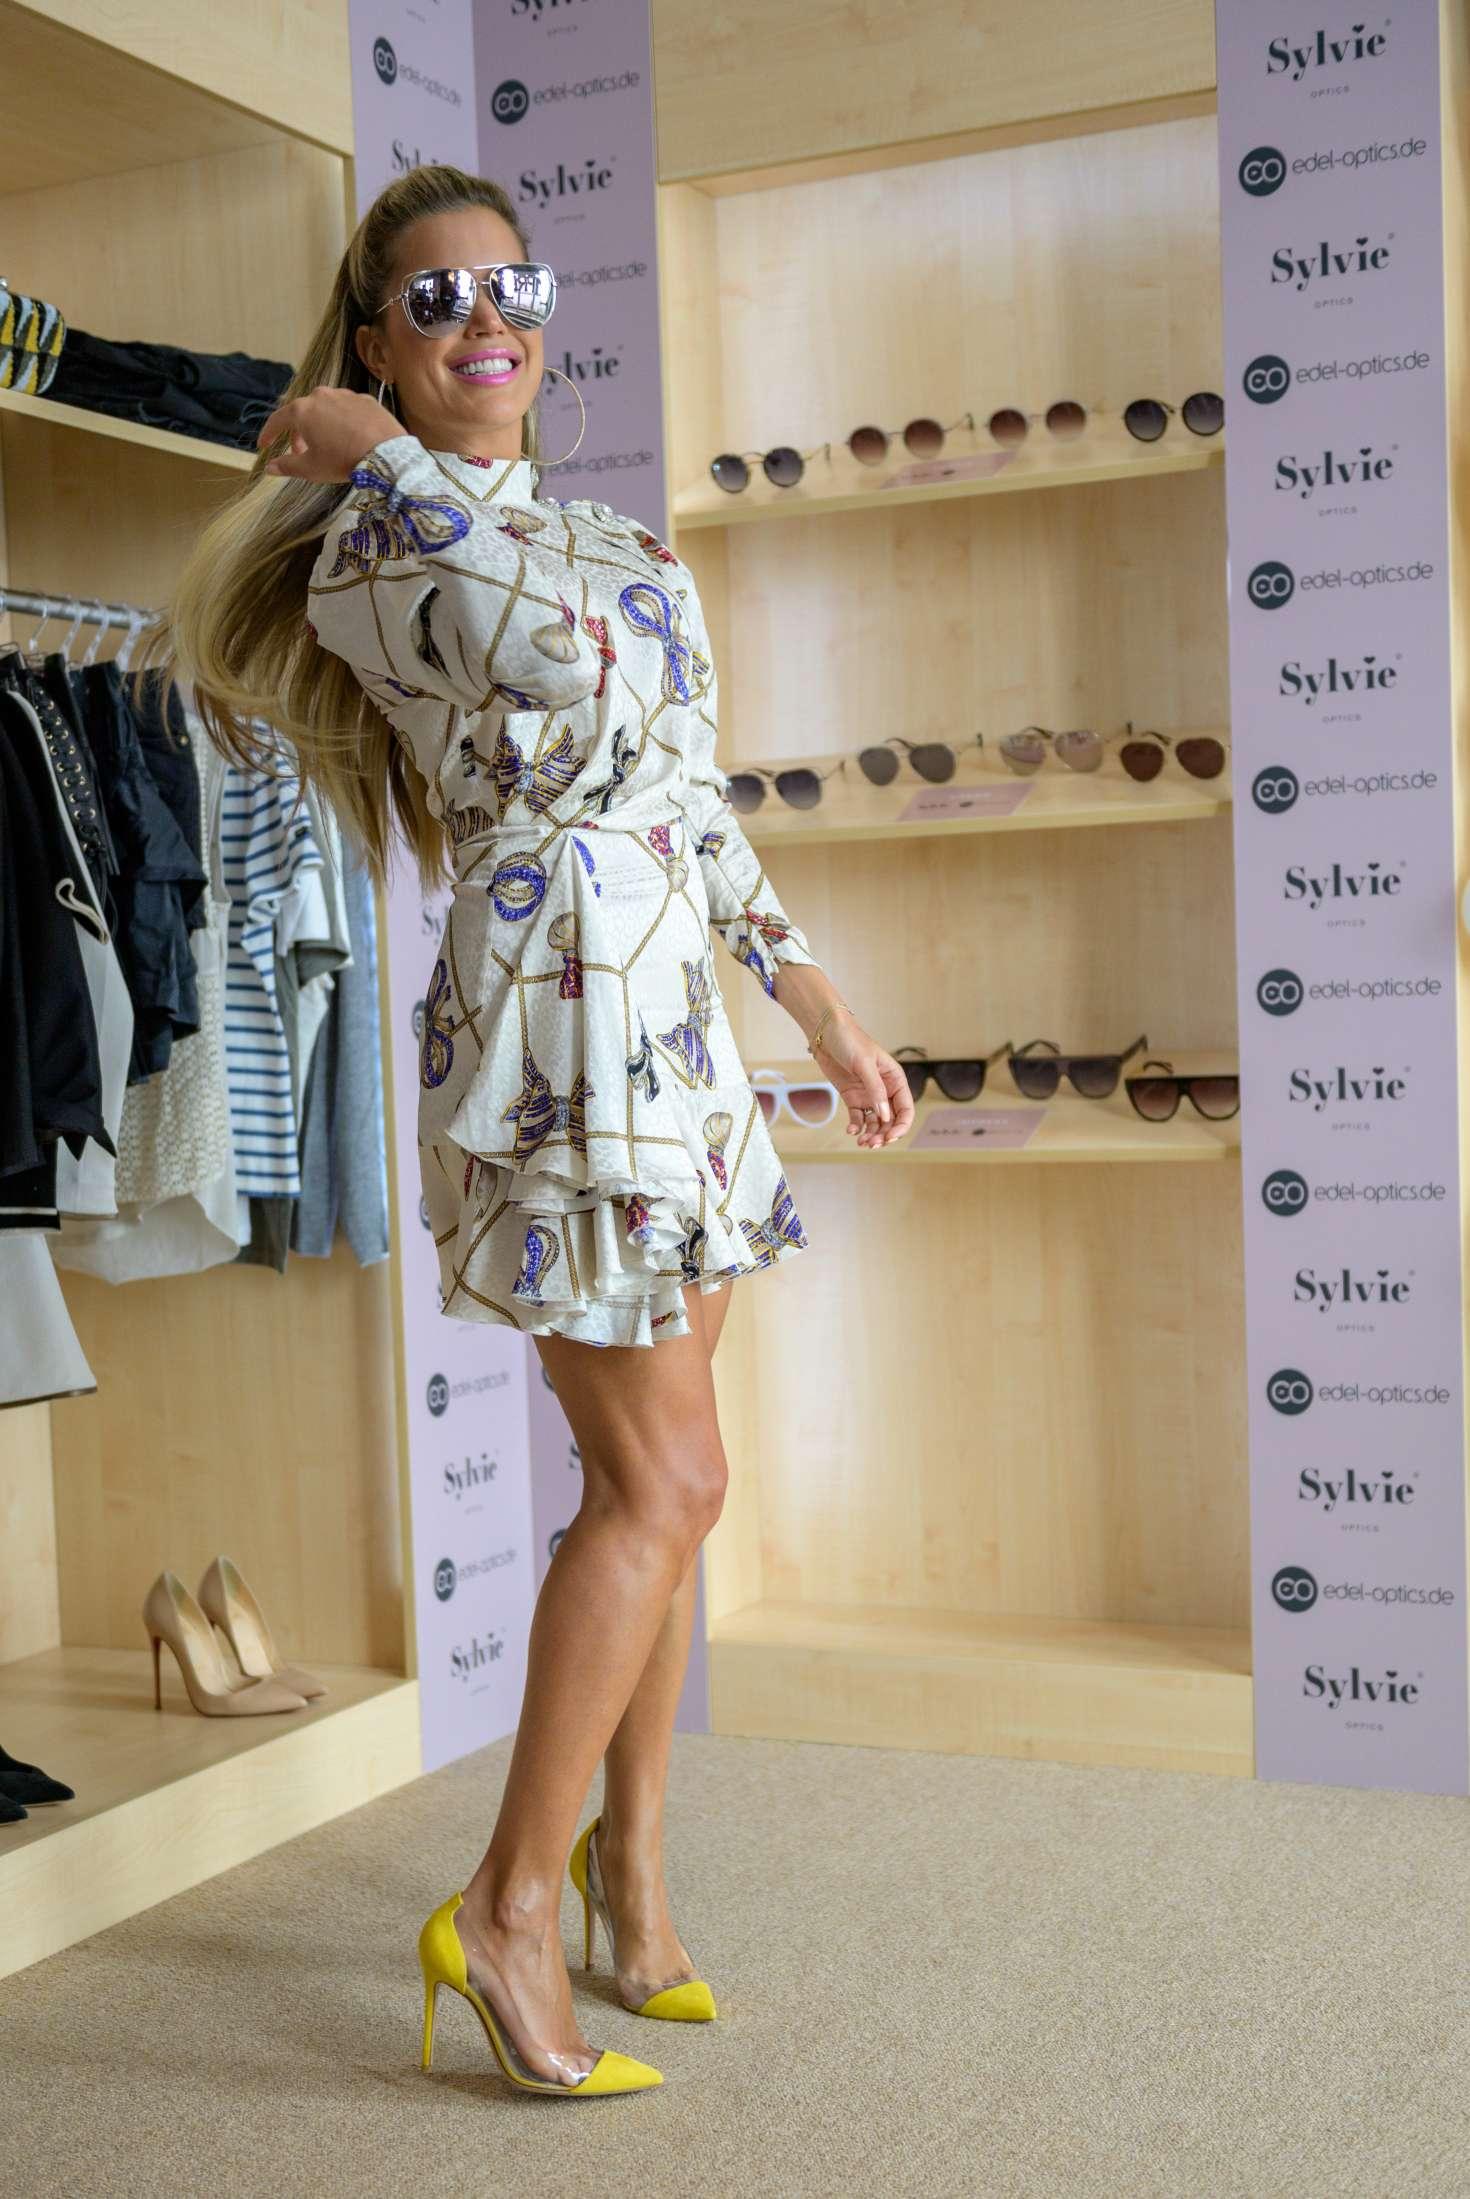 Sylvie Meis 2019 : Sylvie Meis: Presents her edel optics eyewear collection -04